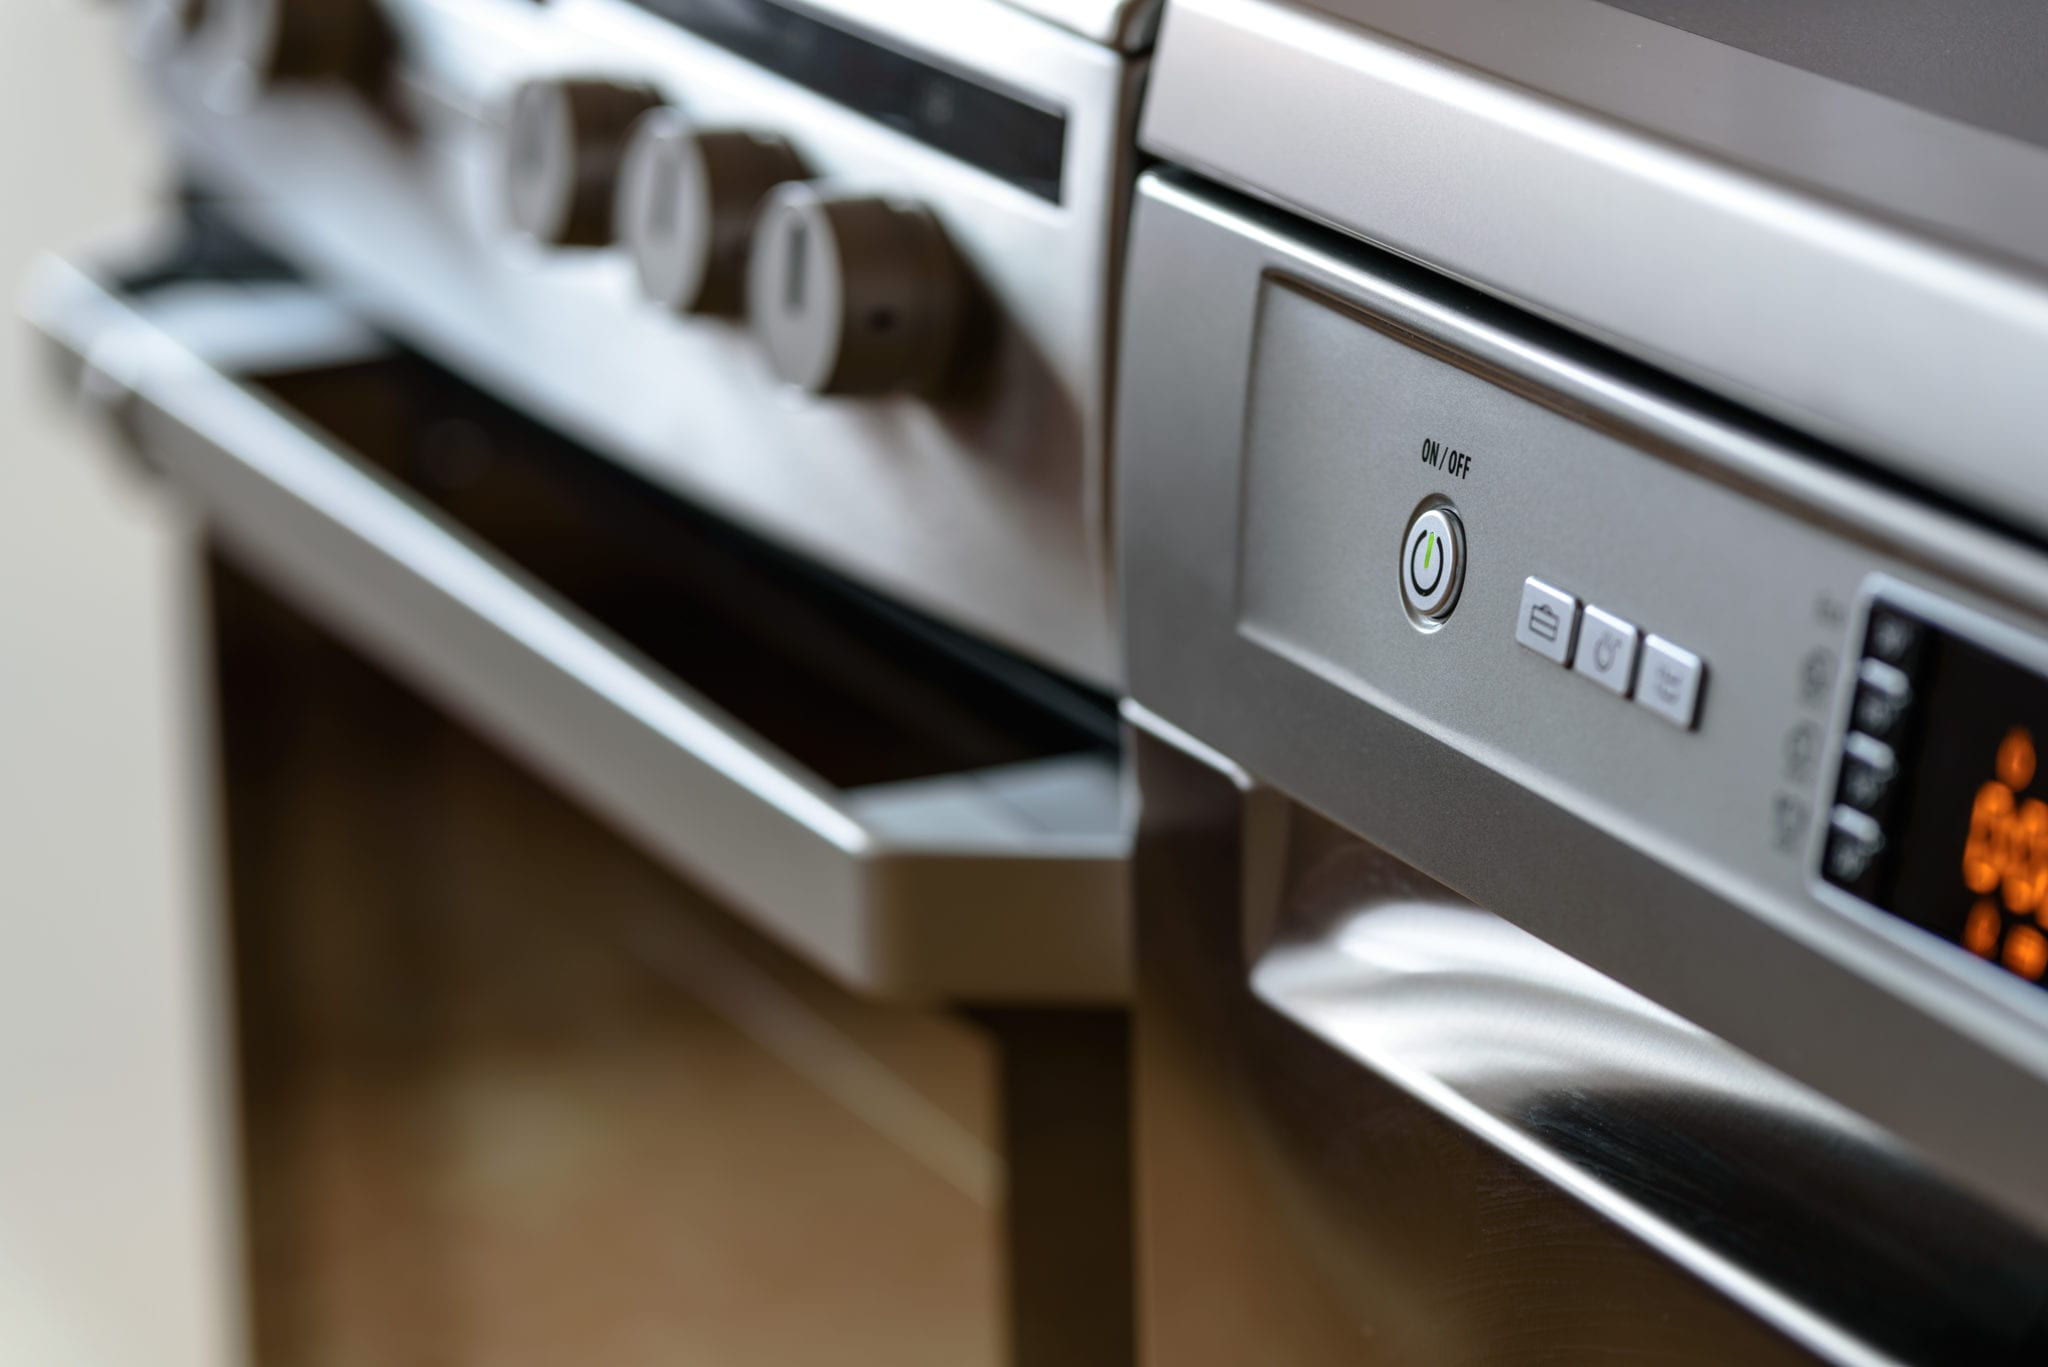 Metallic stove and dishwasher in the kitchen